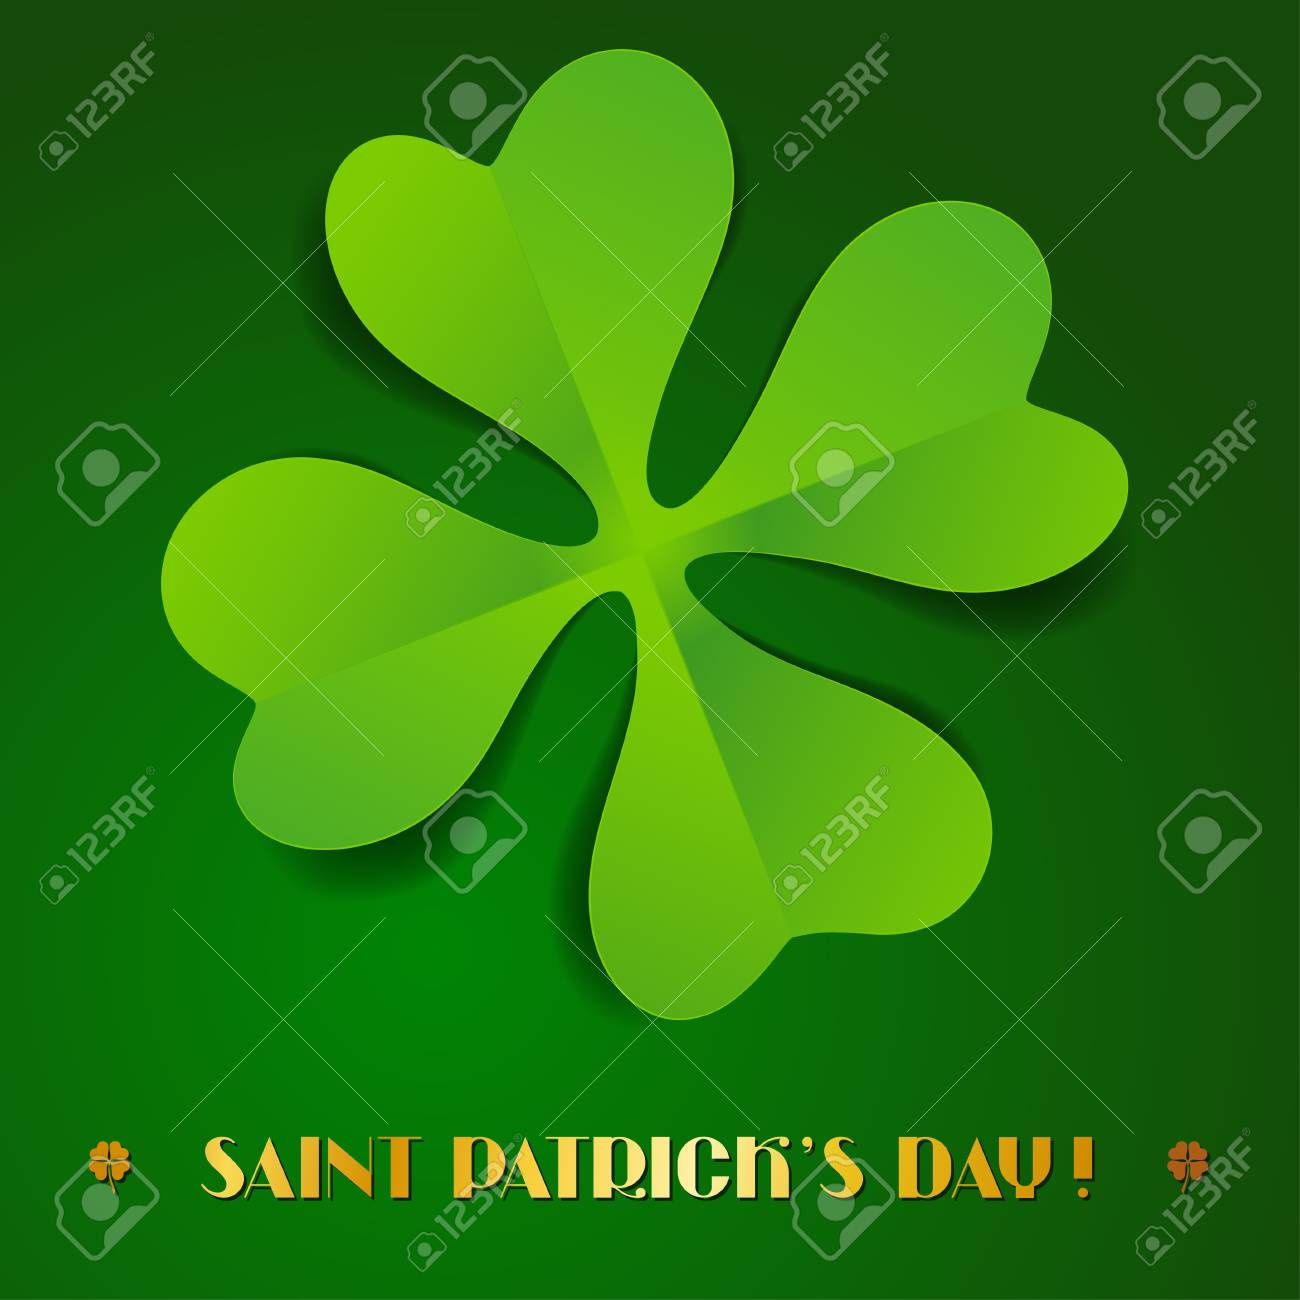 Saint Patrick s Day background Stock Vector - 17417715